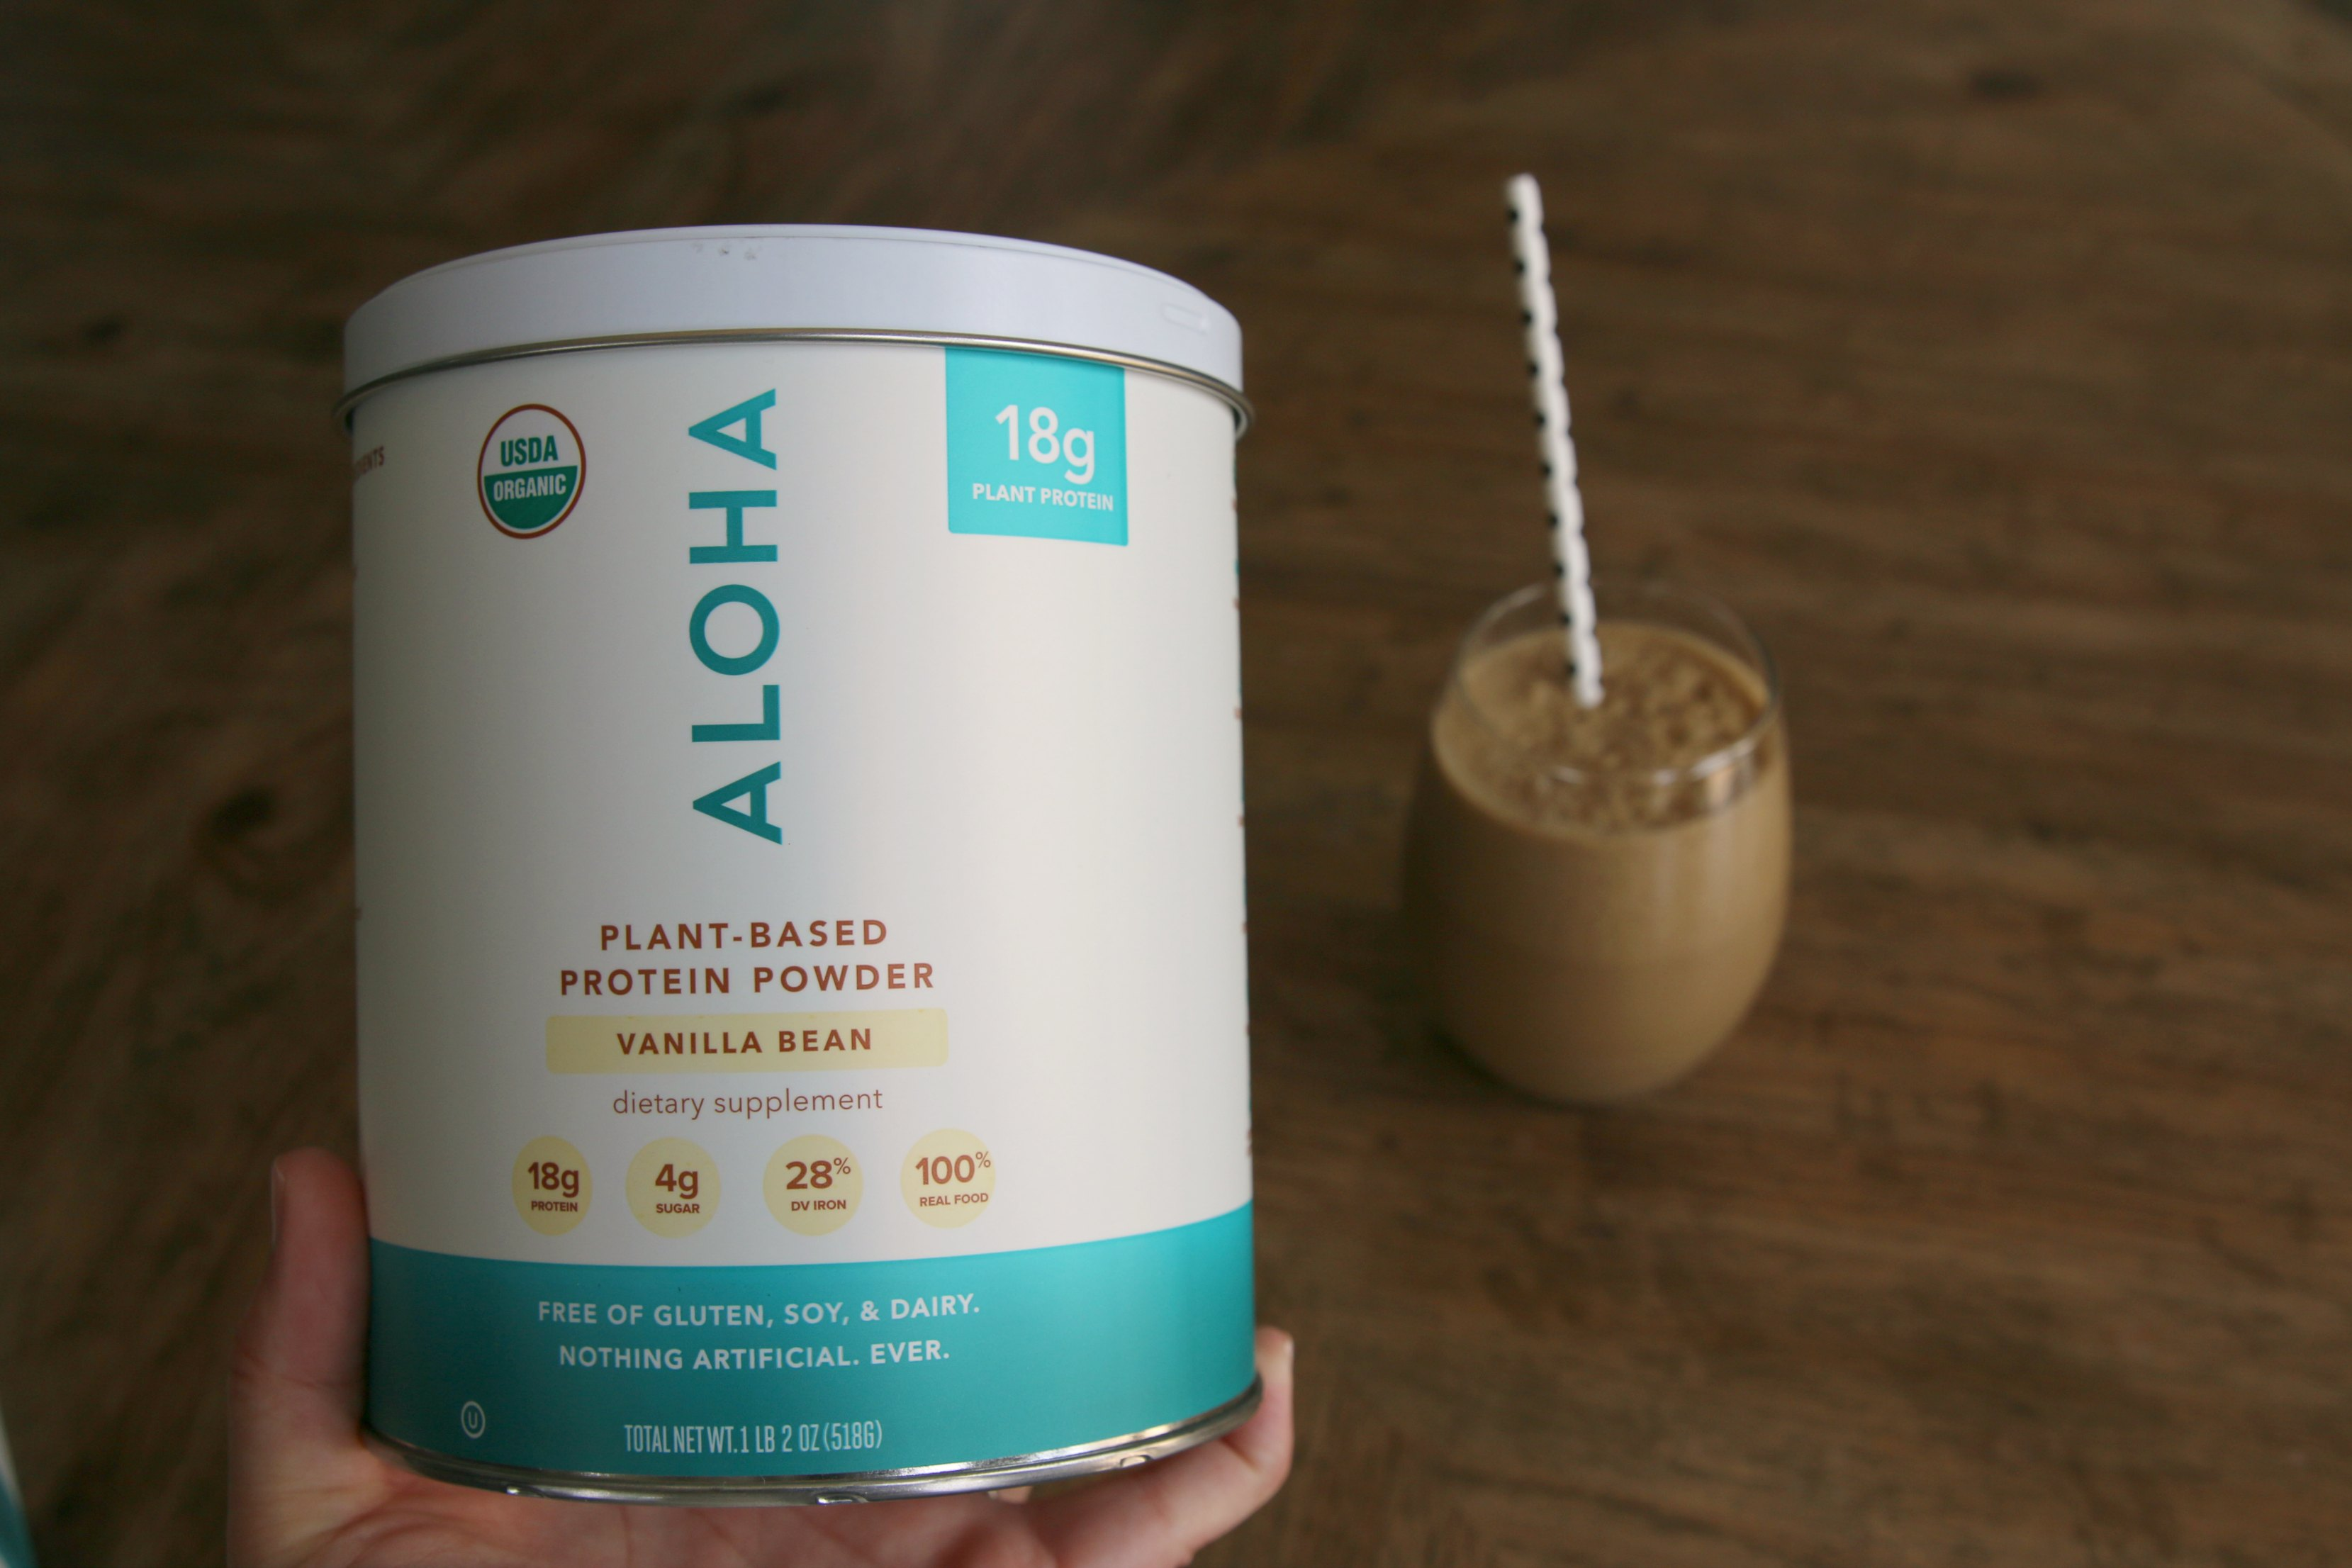 Aloha plant based protein